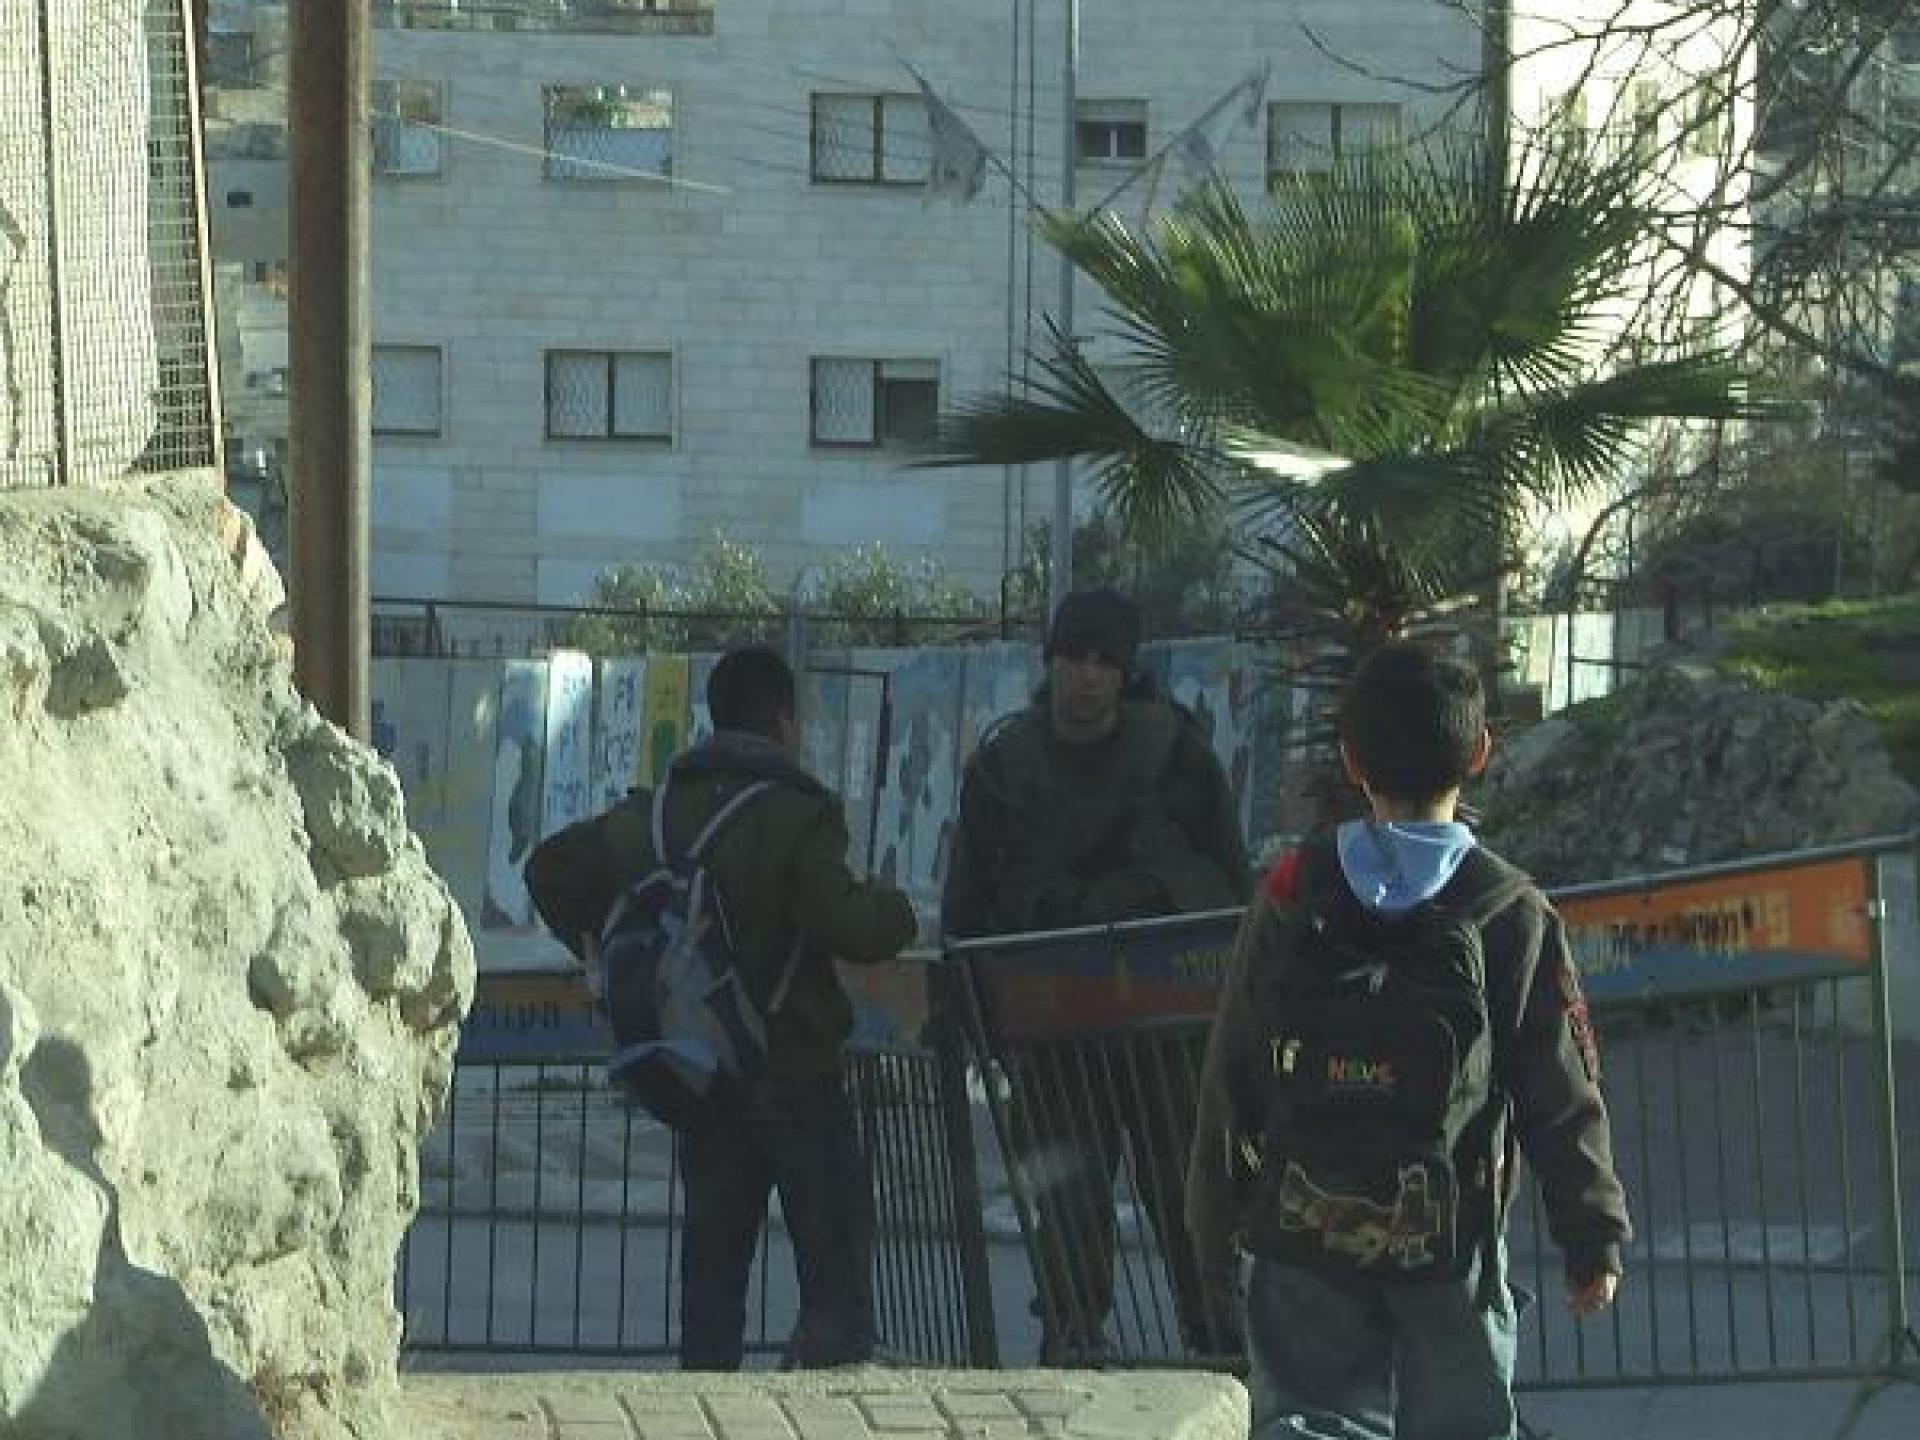 Hebron 04.02.09